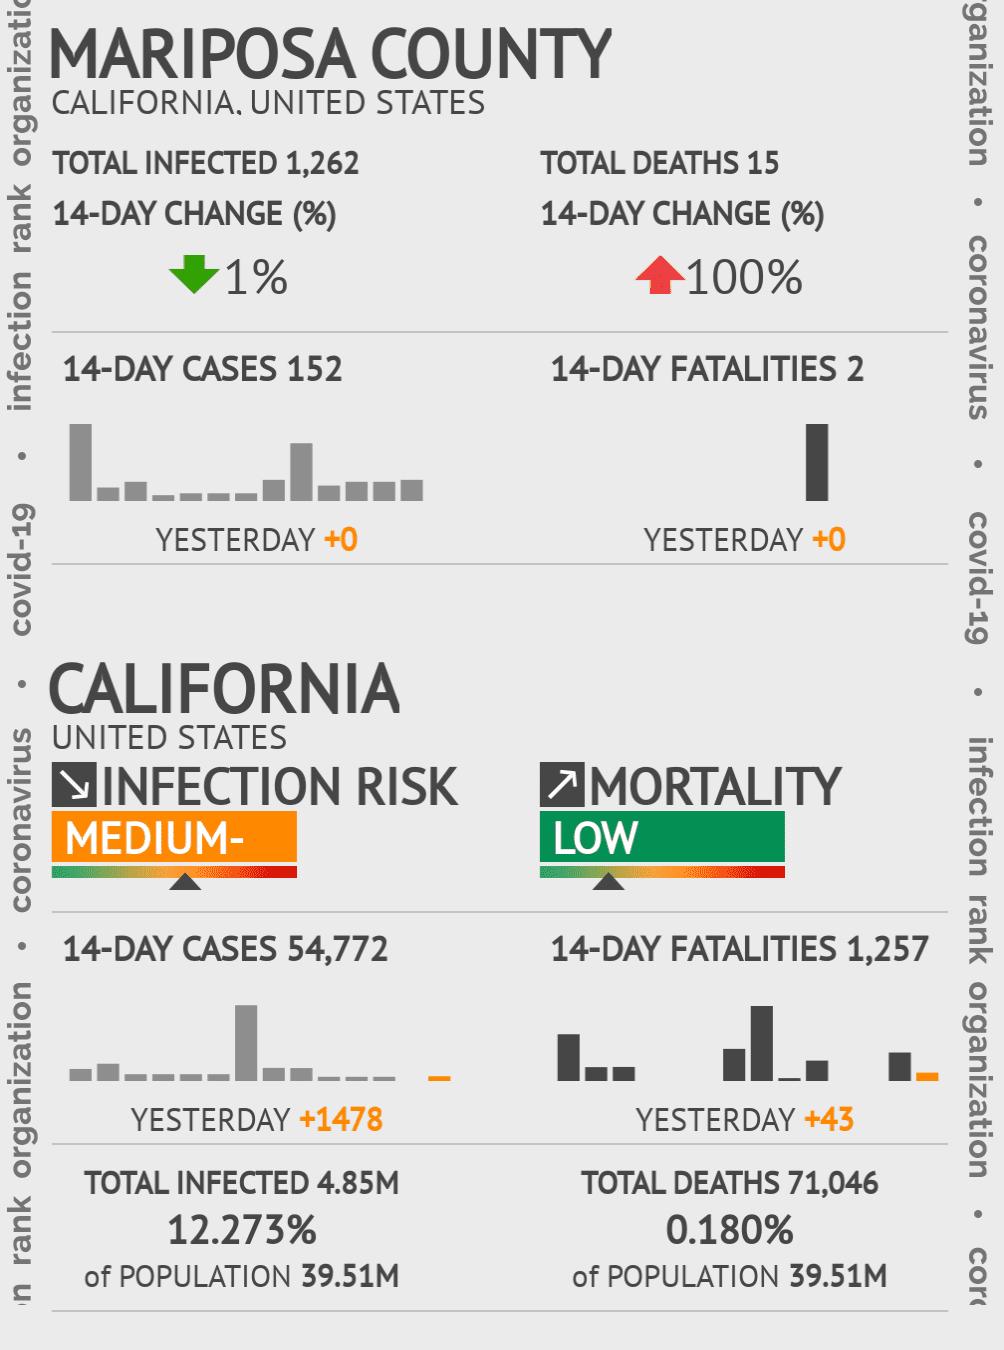 Mariposa County Coronavirus Covid-19 Risk of Infection on October 16, 2020